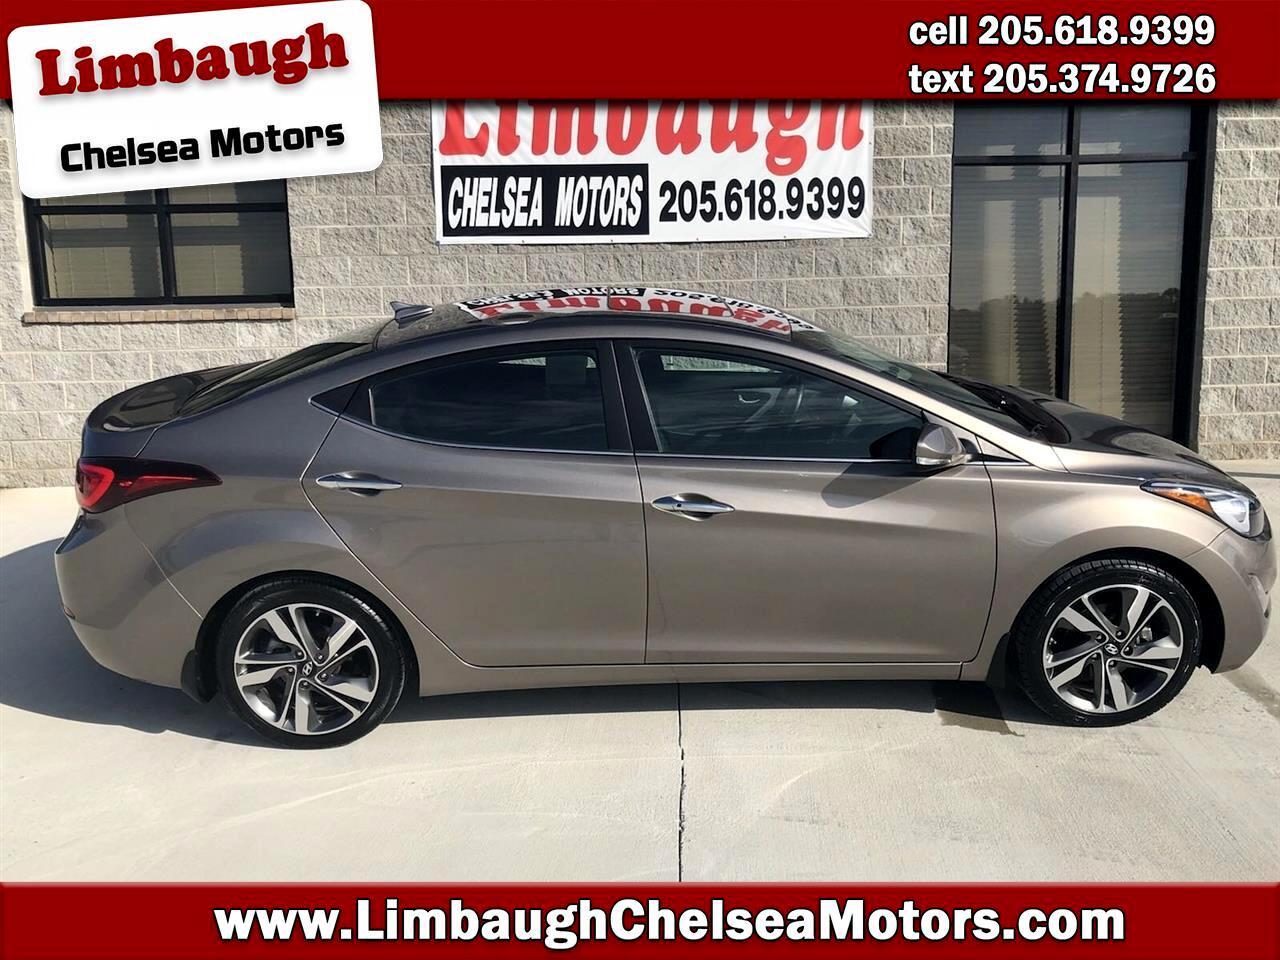 2015 Hyundai Elantra 4dr Sdn Auto Limited (Alabama Plant)